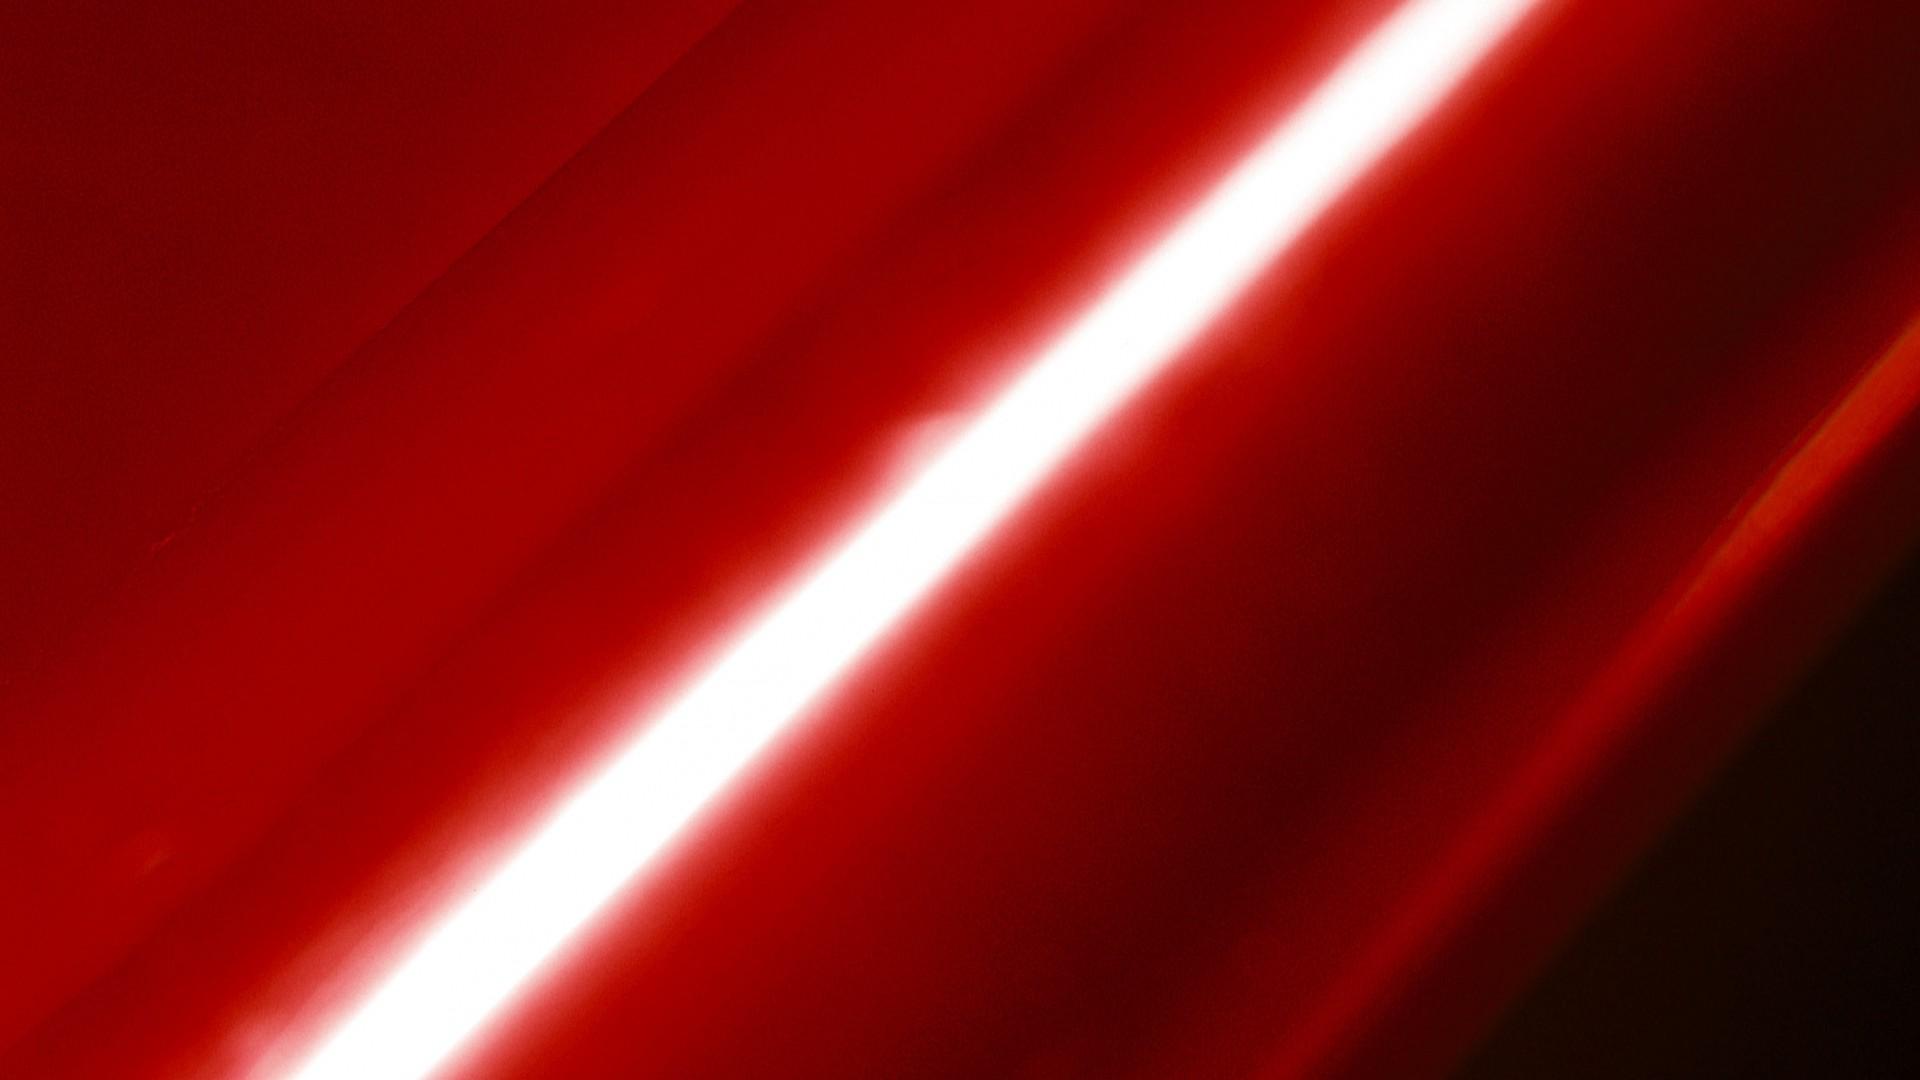 Wallpaper light, line, shiny, red